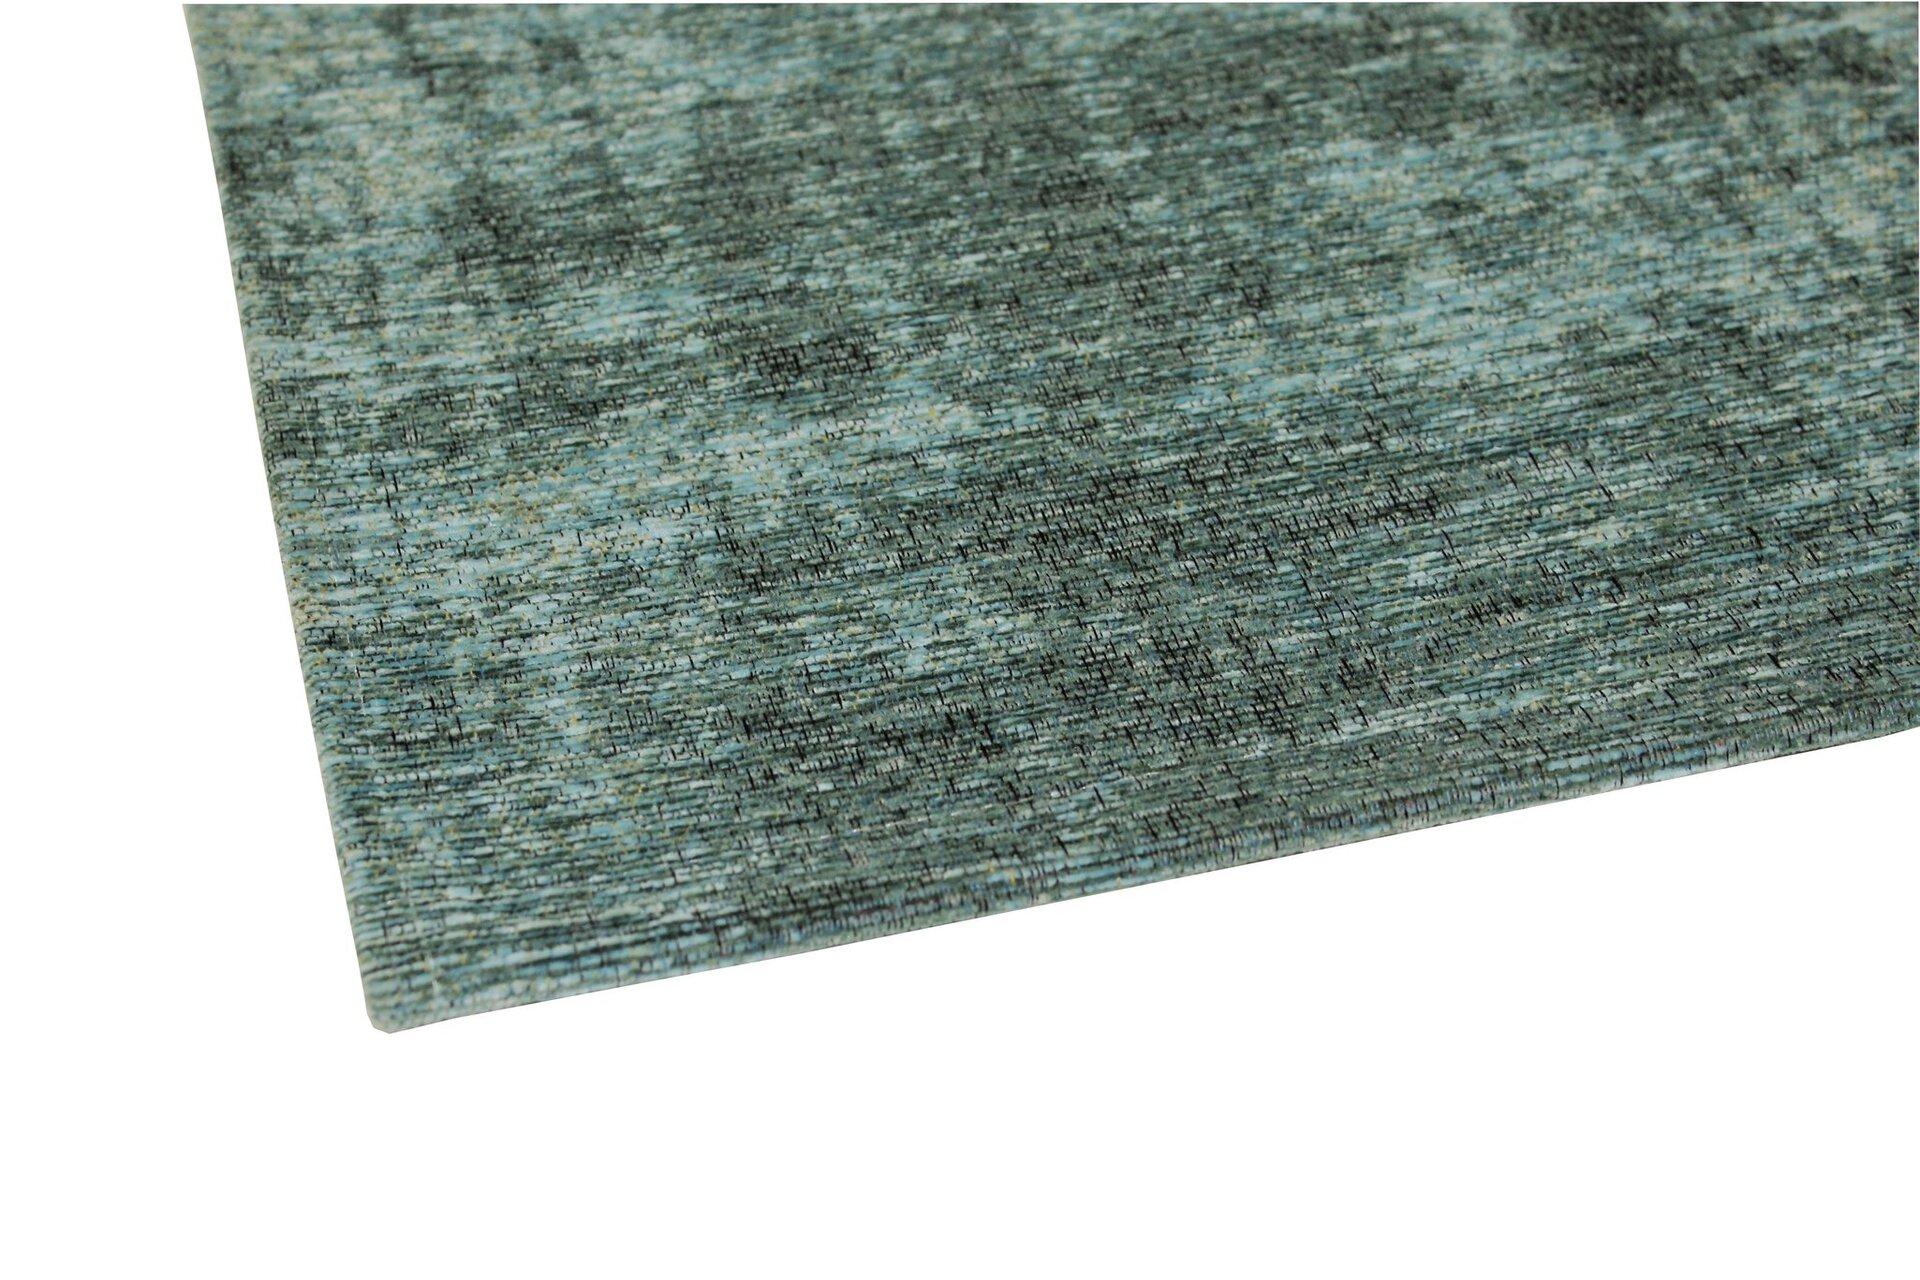 Maschinenwebteppich Saragoza DEKOWE Textil Blau 155 x 230 cm